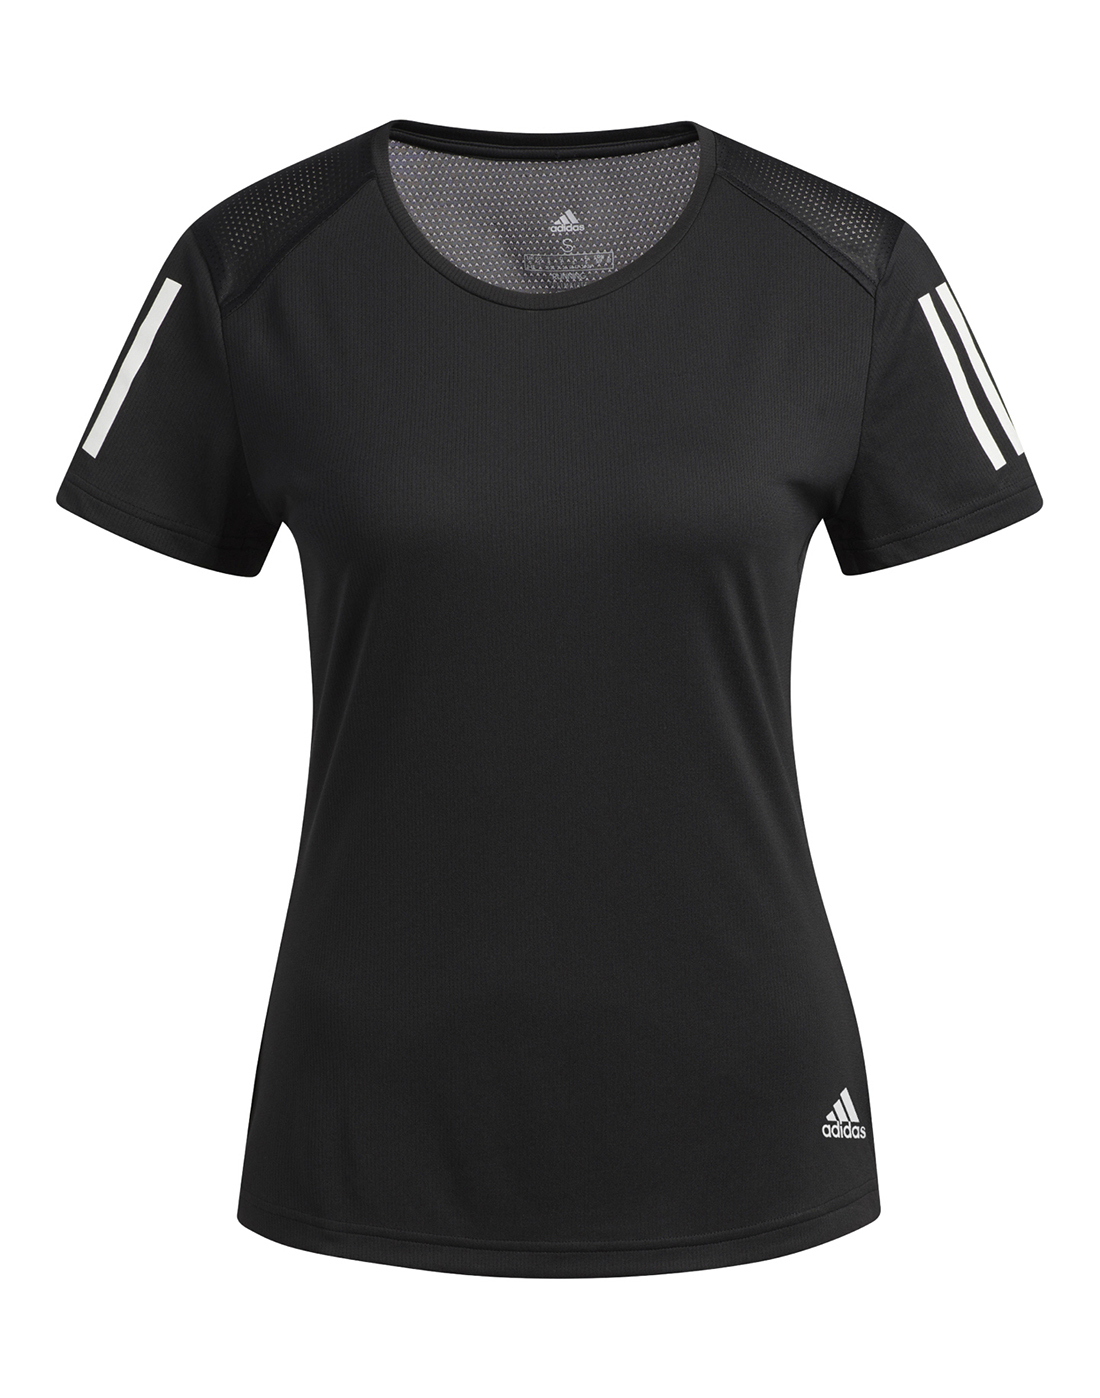 Women's Black adidas Running T-Shirt | Life Style Sports